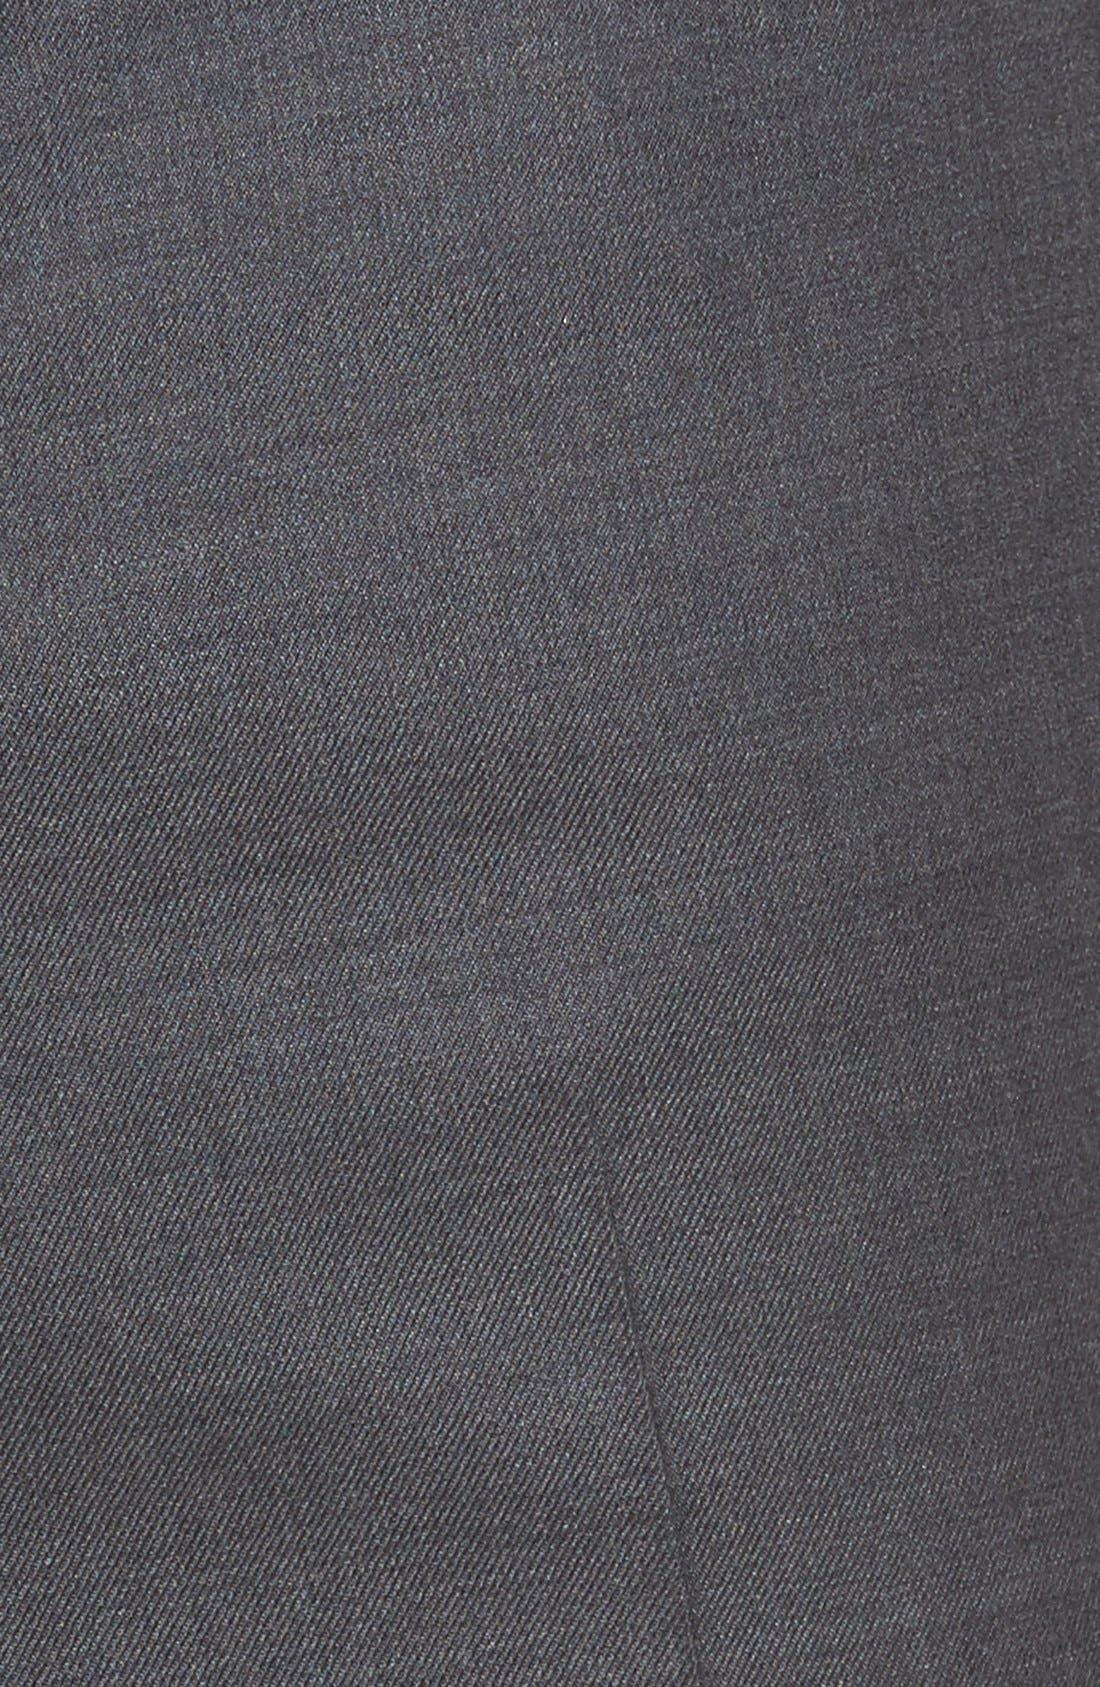 Ryan Regular Fit Wool Trousers,                             Alternate thumbnail 5, color,                             Charcoal